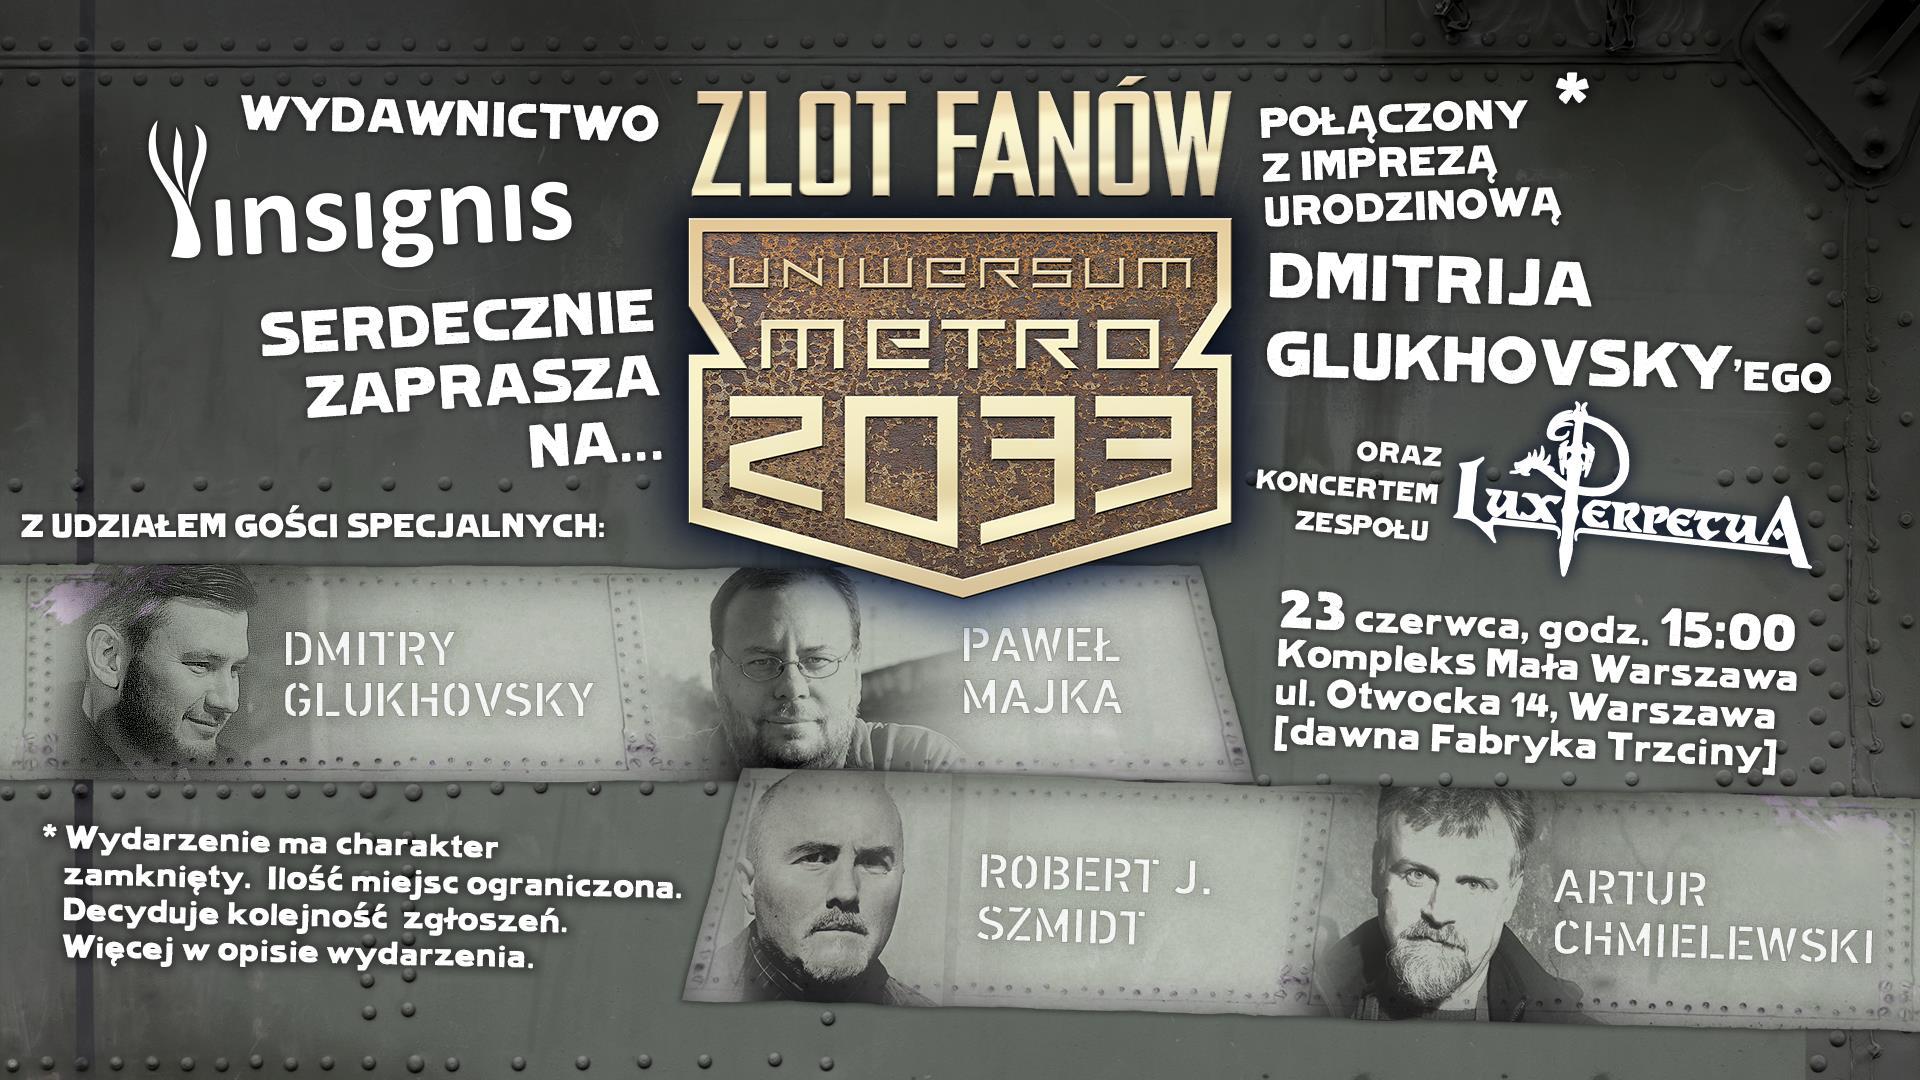 Photo of Zlot fanów Uniwersum Metro 2033